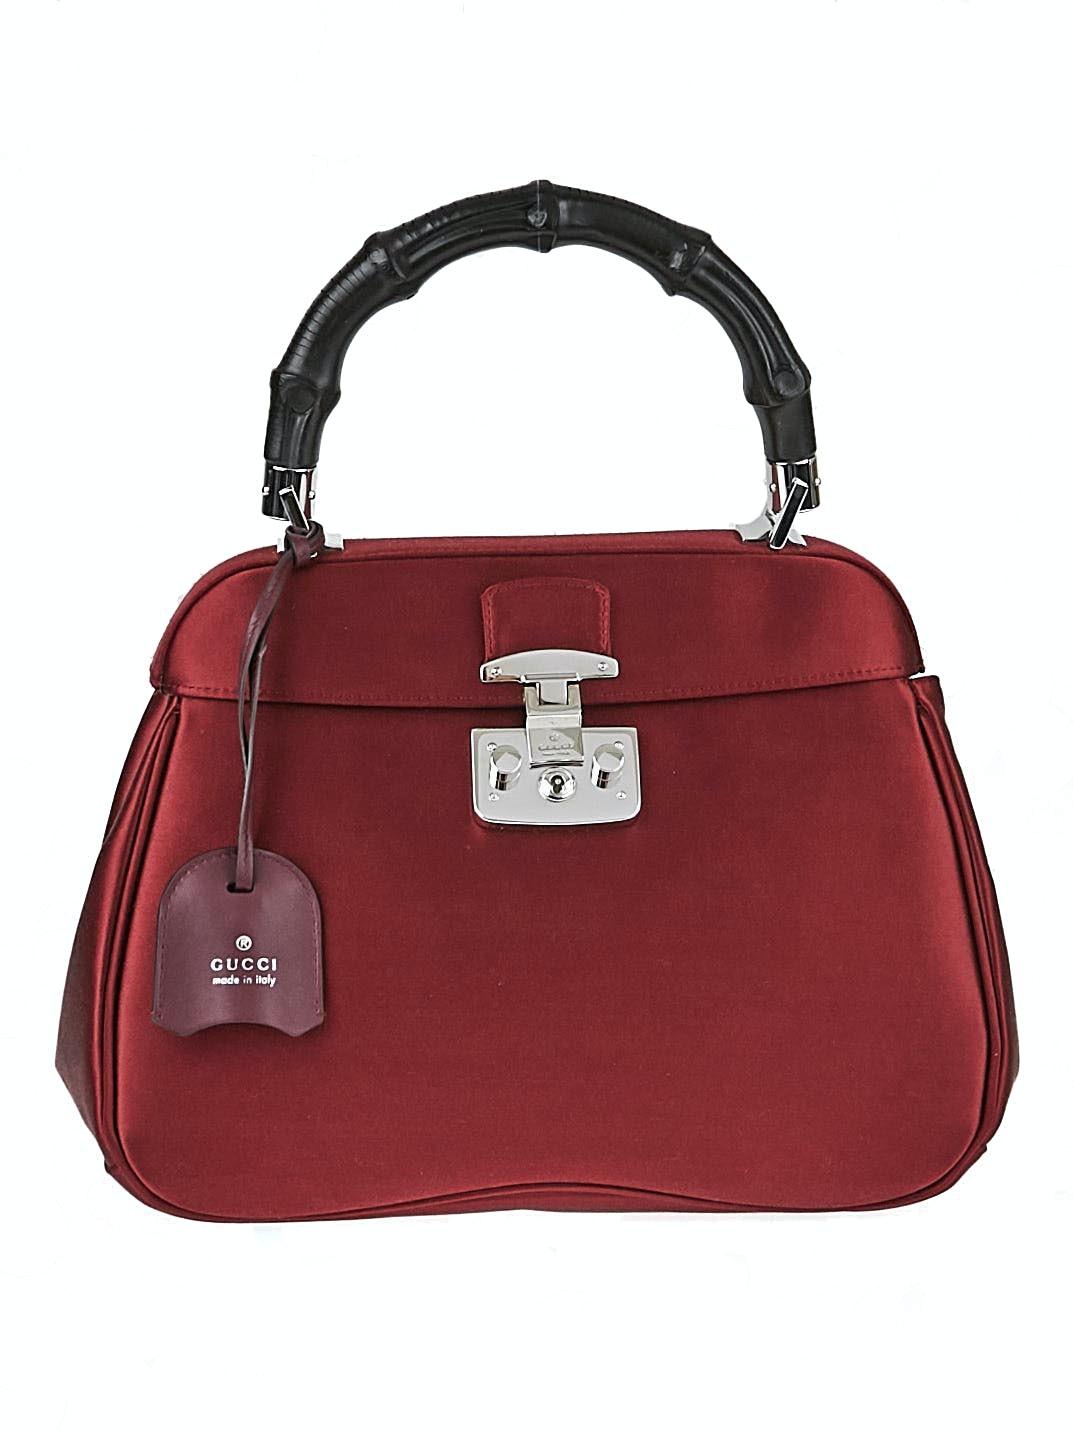 Gucci Lady Lock Bamboo Top Handle Mini Red